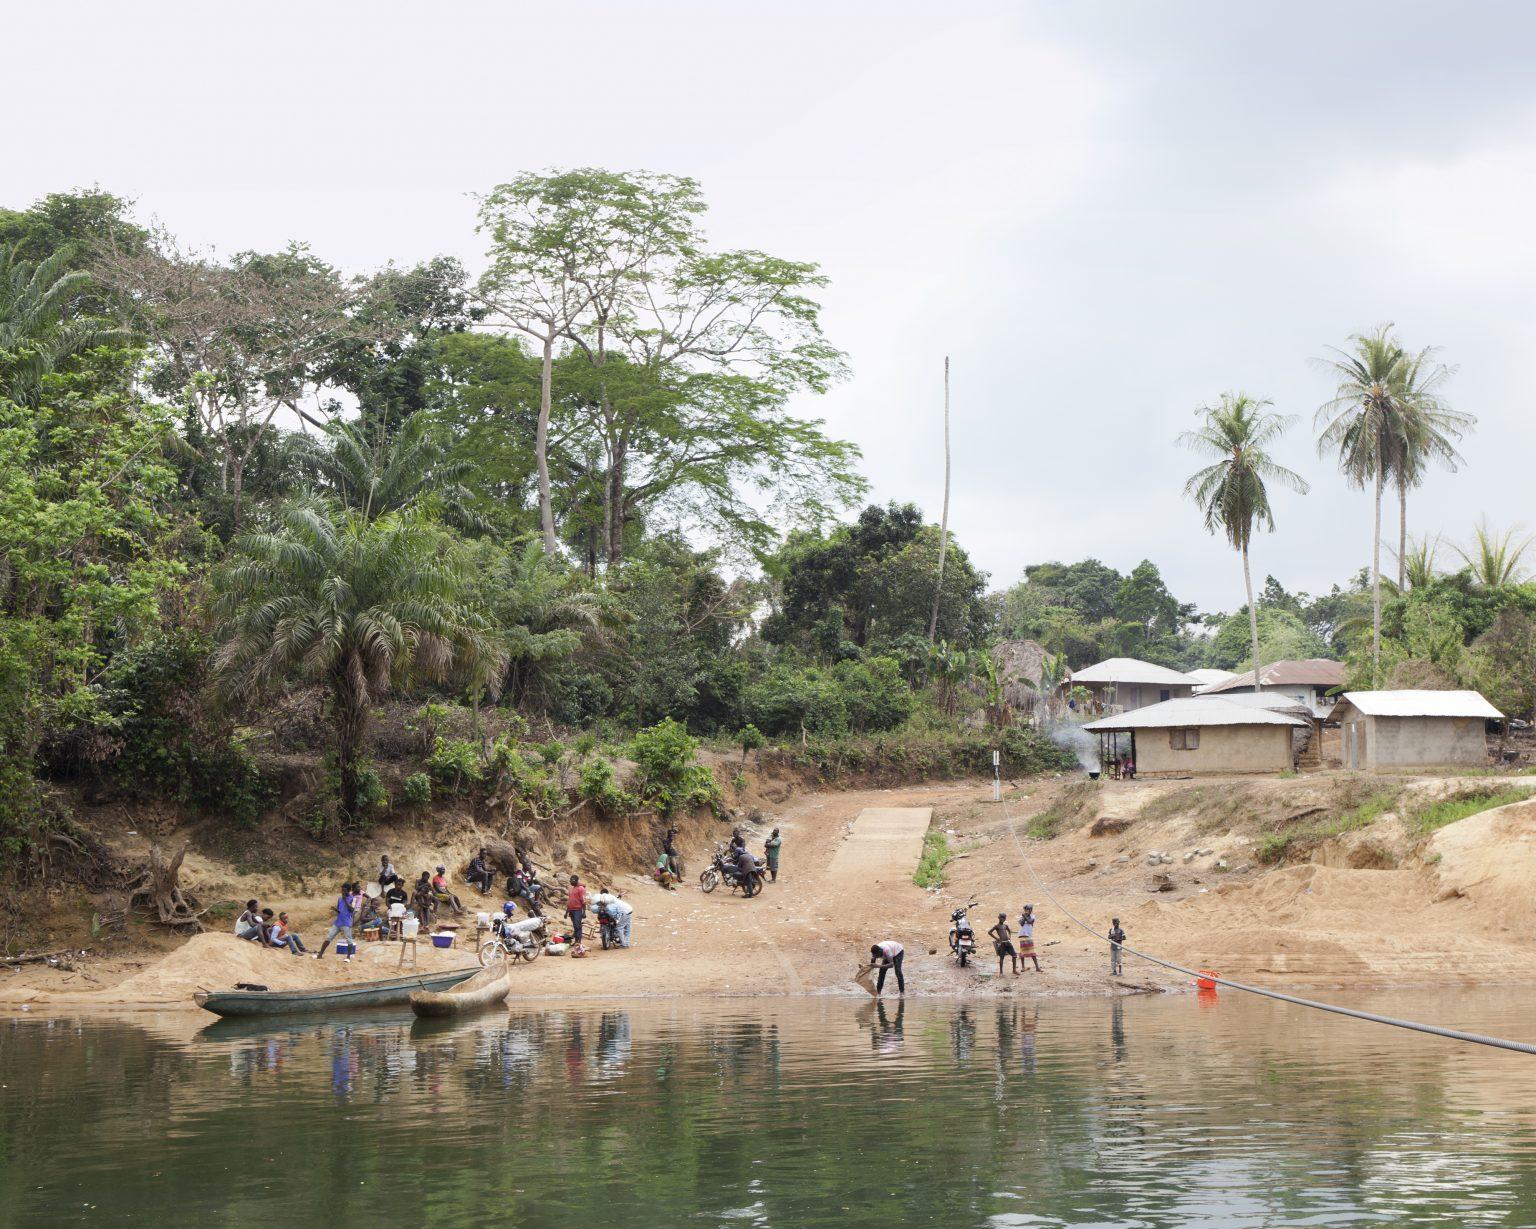 Mattru, Bonthe District (Sierra Leone). The river to cross to reach Mattru, the capital of the district. >< Mattru, distretto di Bonthe (Sierra Leone). Il fiume da attraversare per raggiungere Mattru, il capoluogo del distretto.